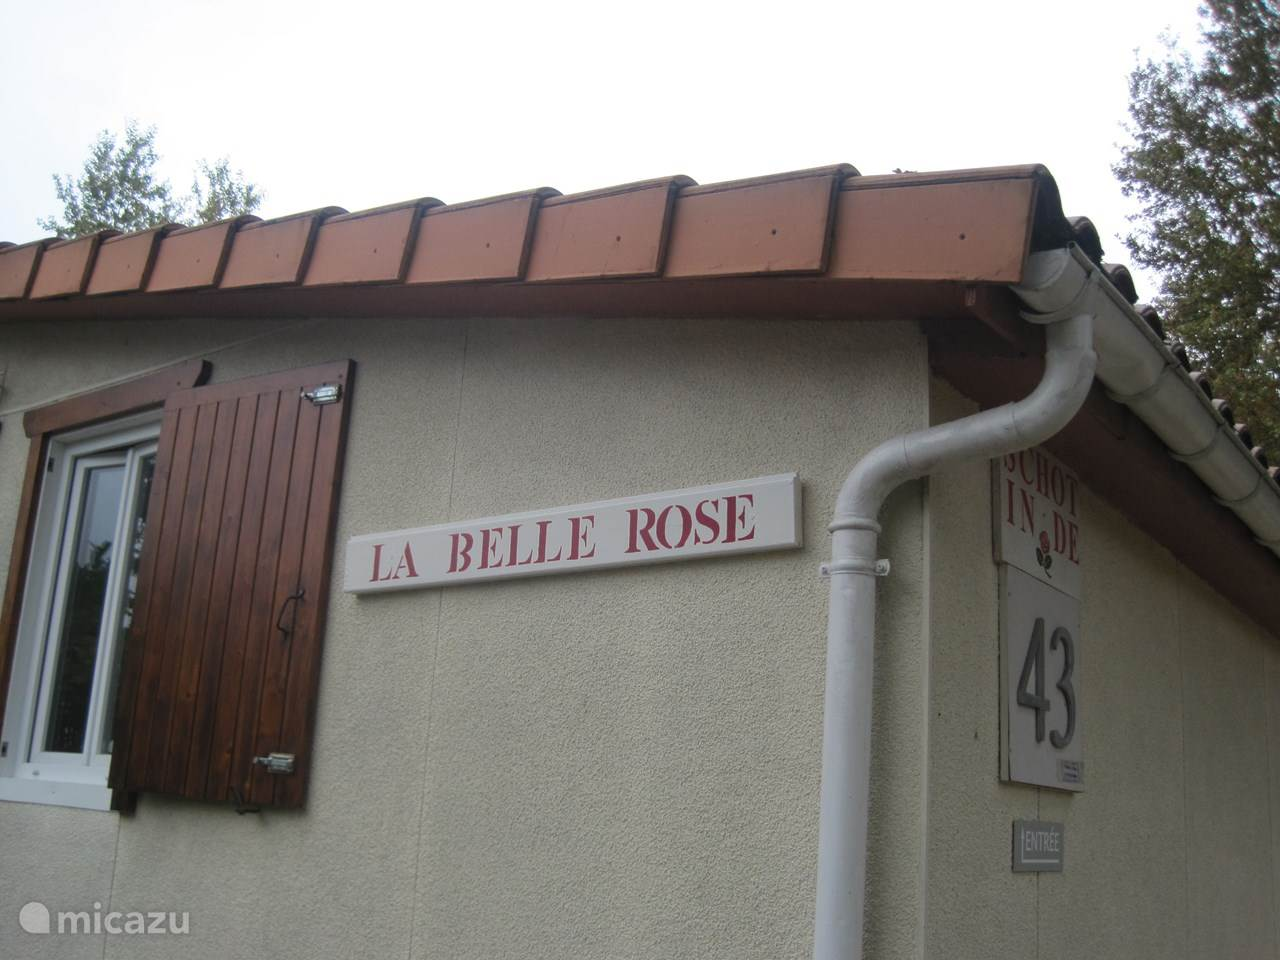 La Maison De Rose Brossac house shot in the rose 43 on le chat in Écuras - charente - france